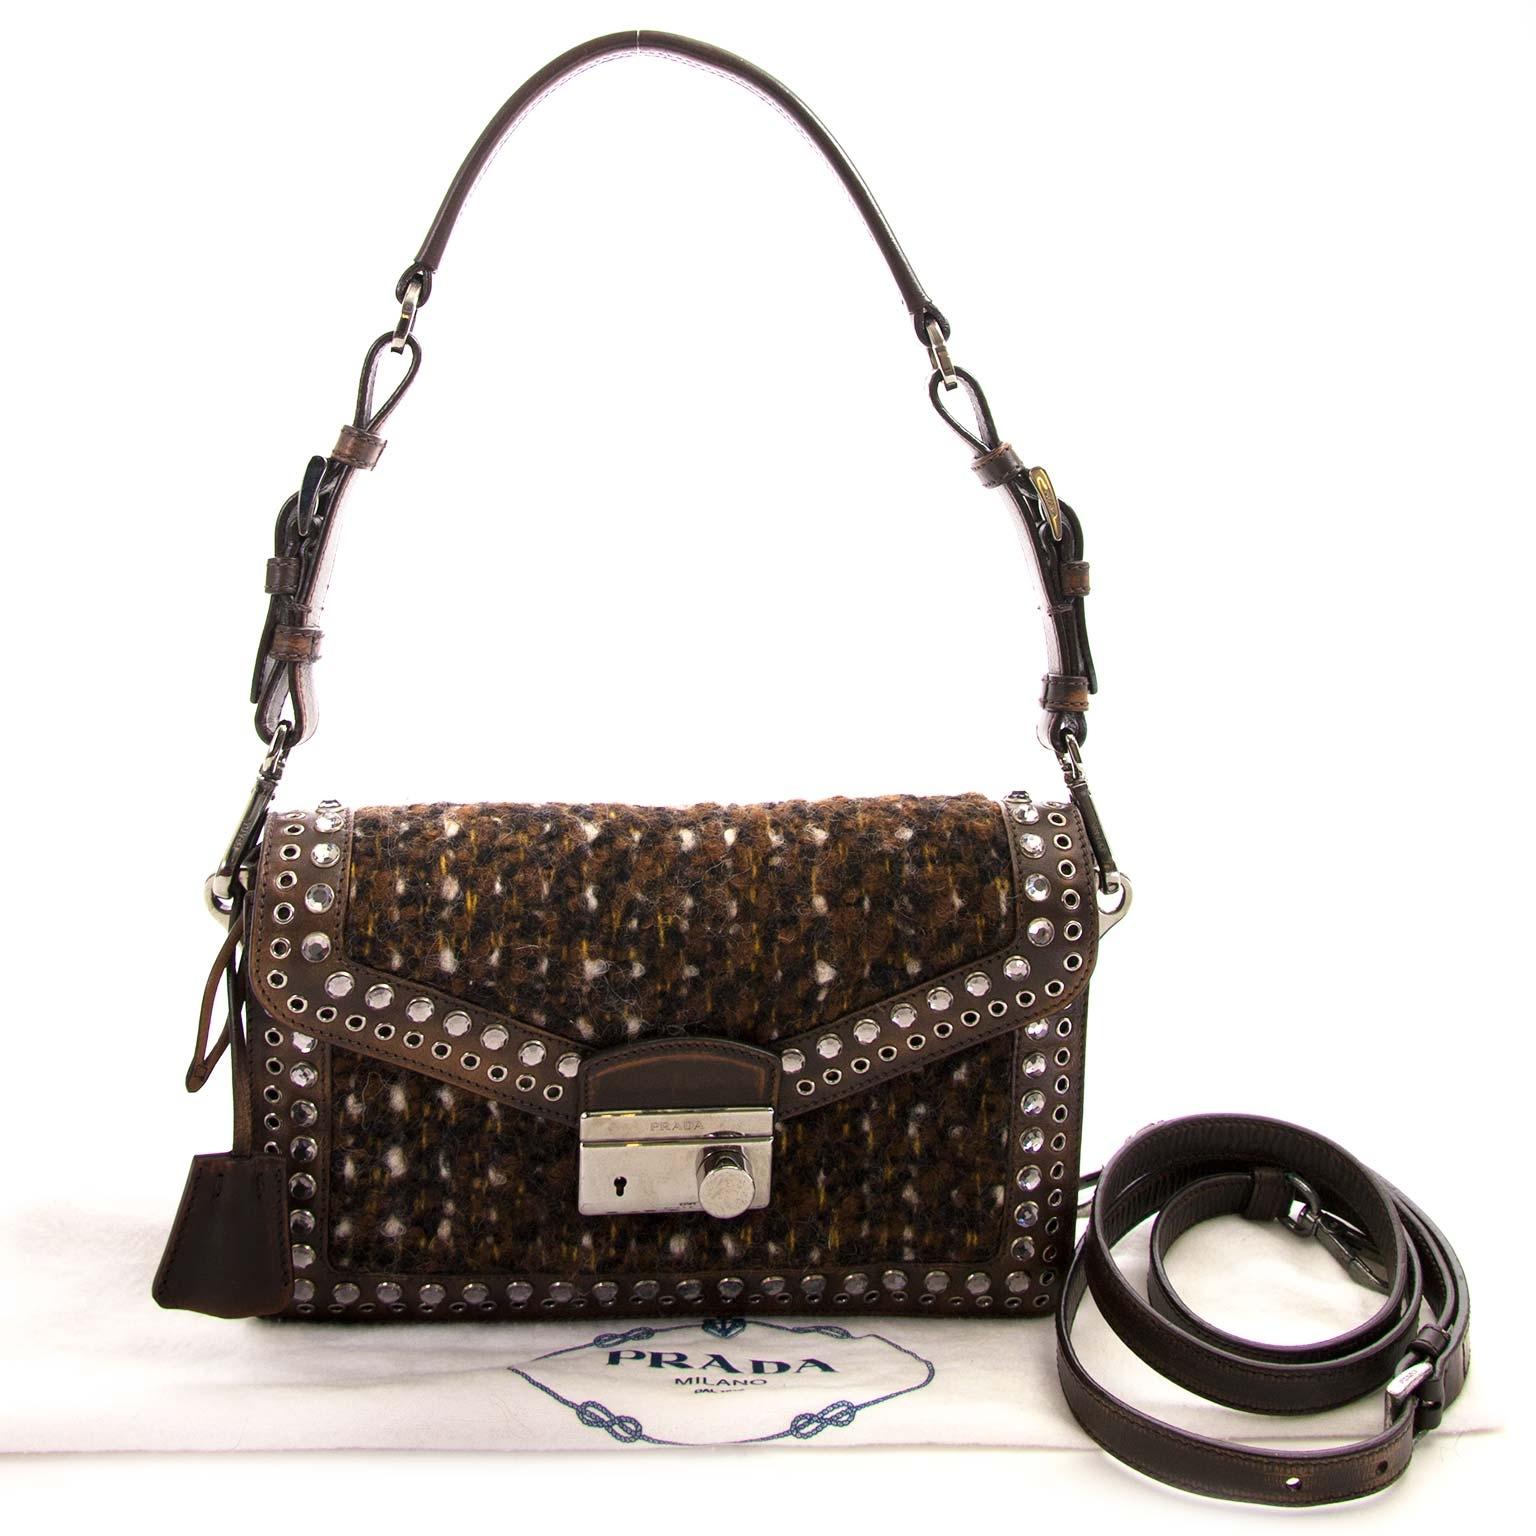 prada brown tweed shoulder bag now for sale at labellov vintage fashion webshop belgium